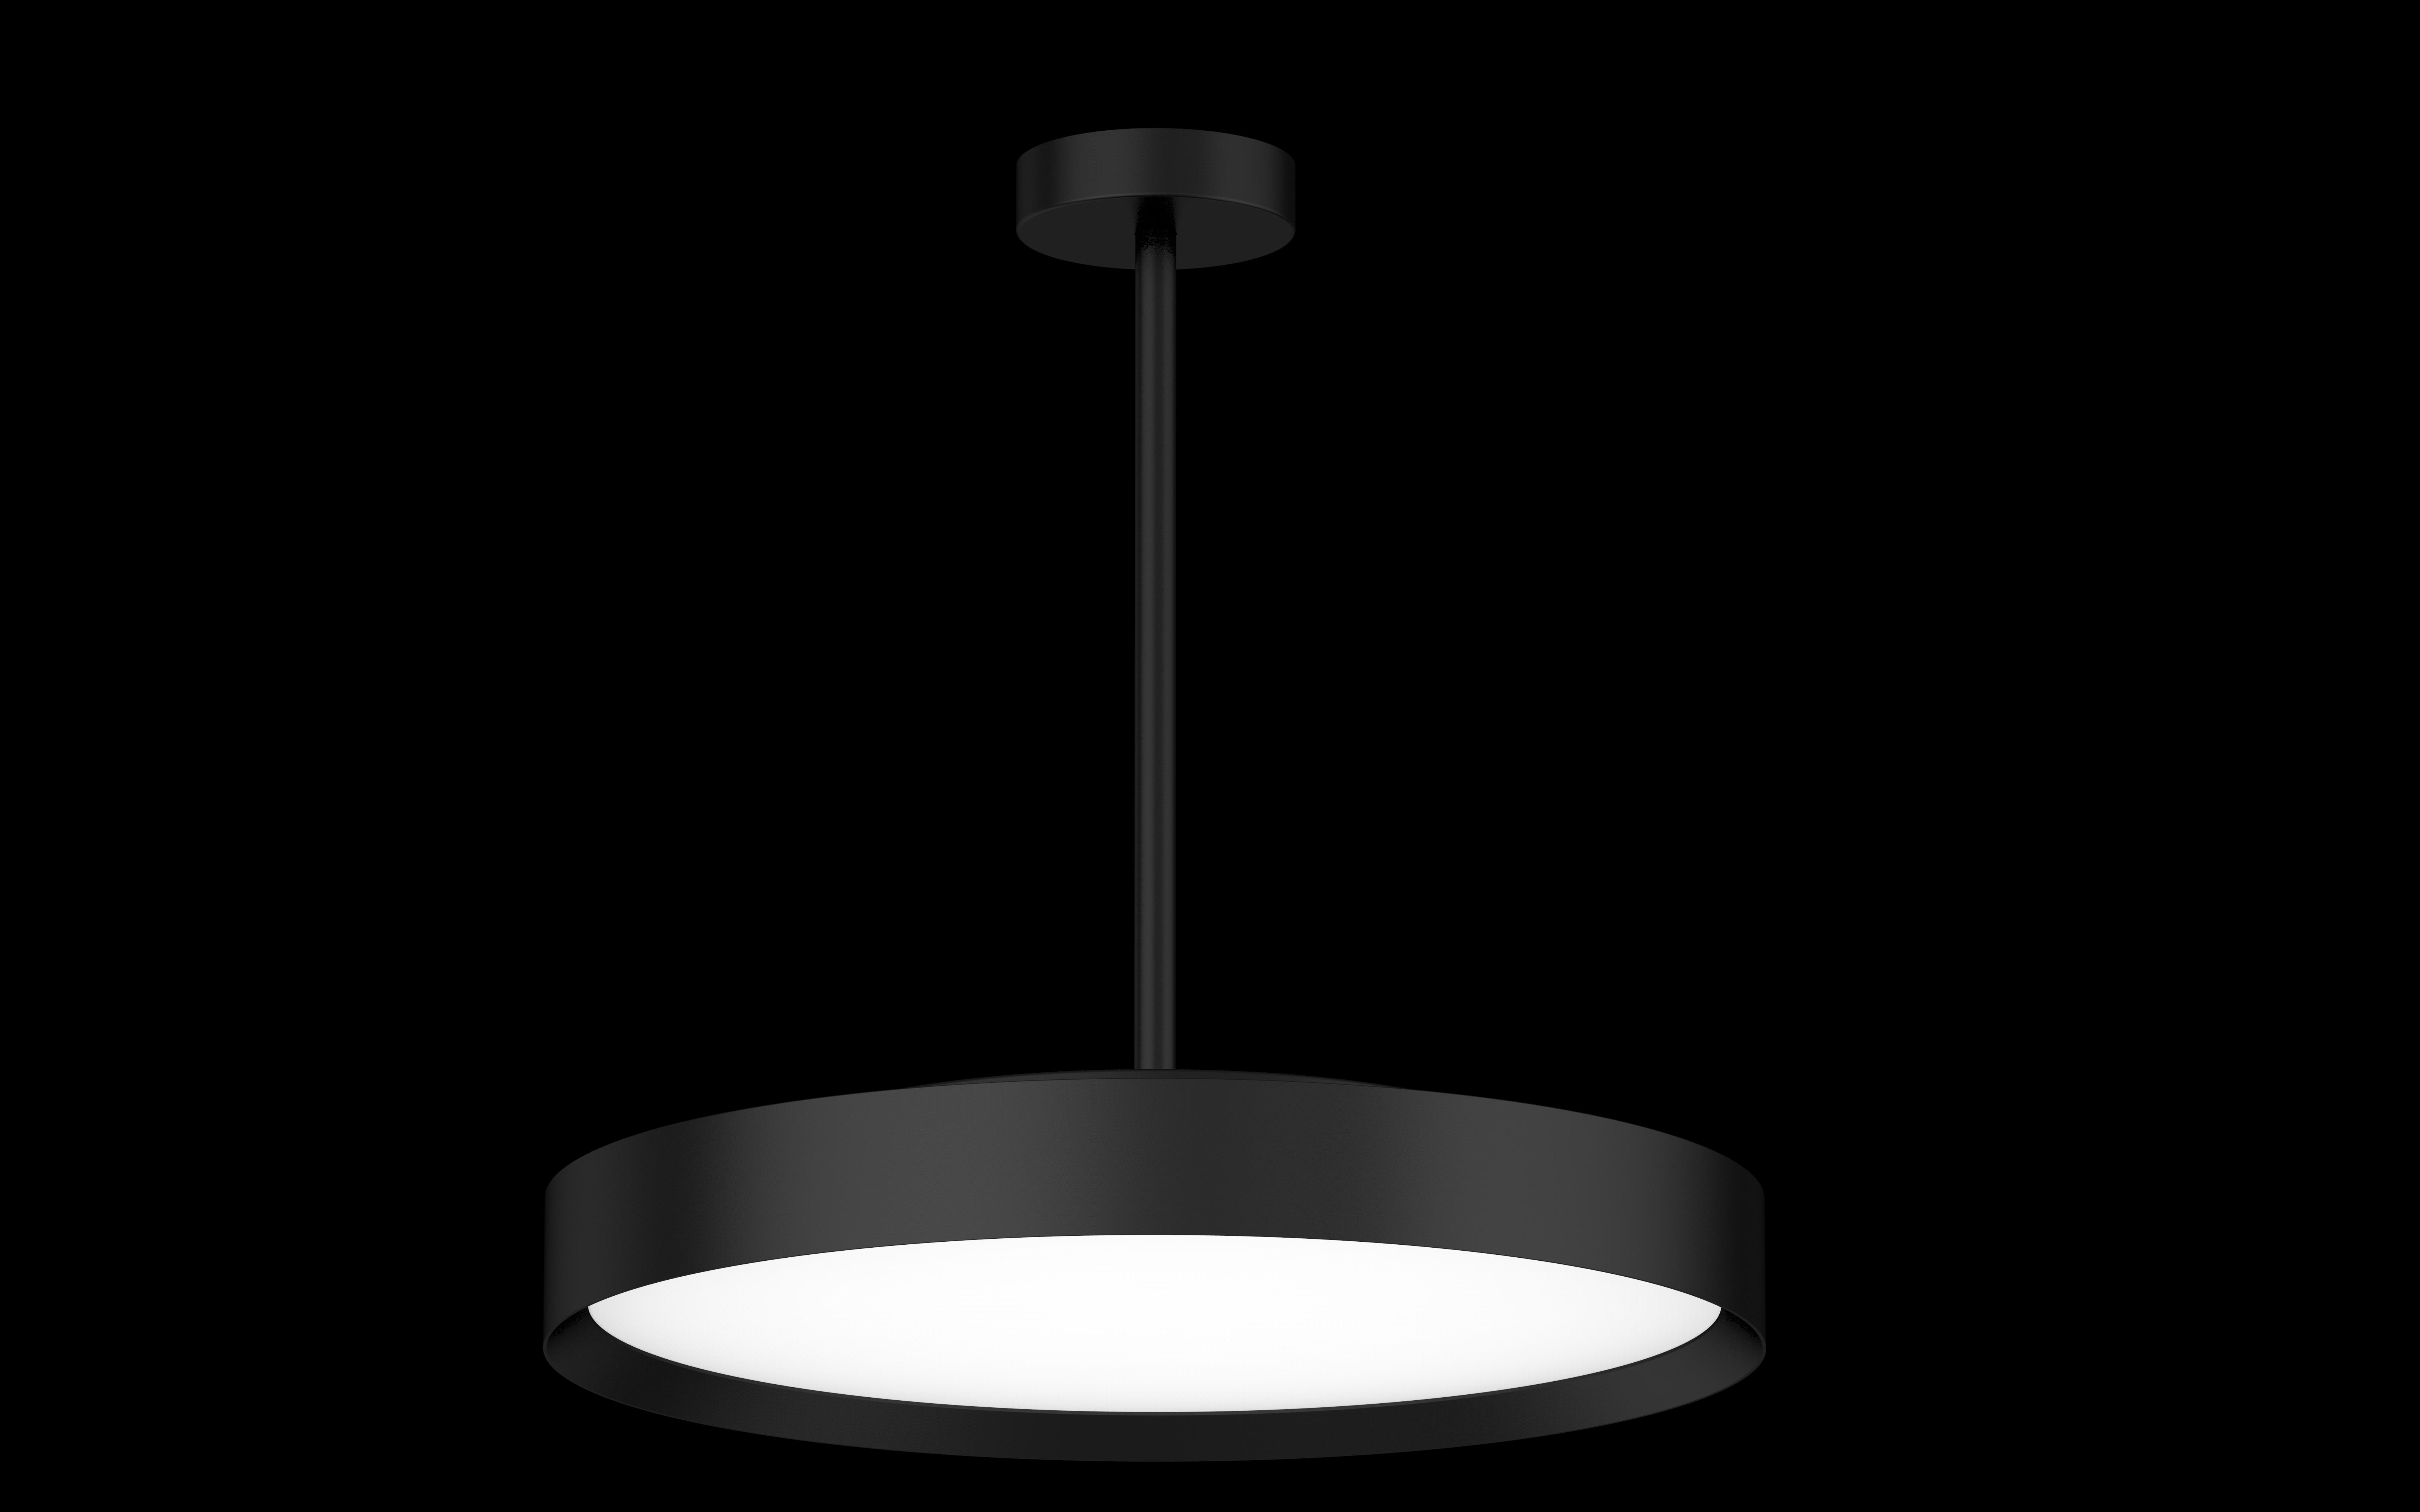 LED Hängeleuchte Rohrabhängung Roma curvy